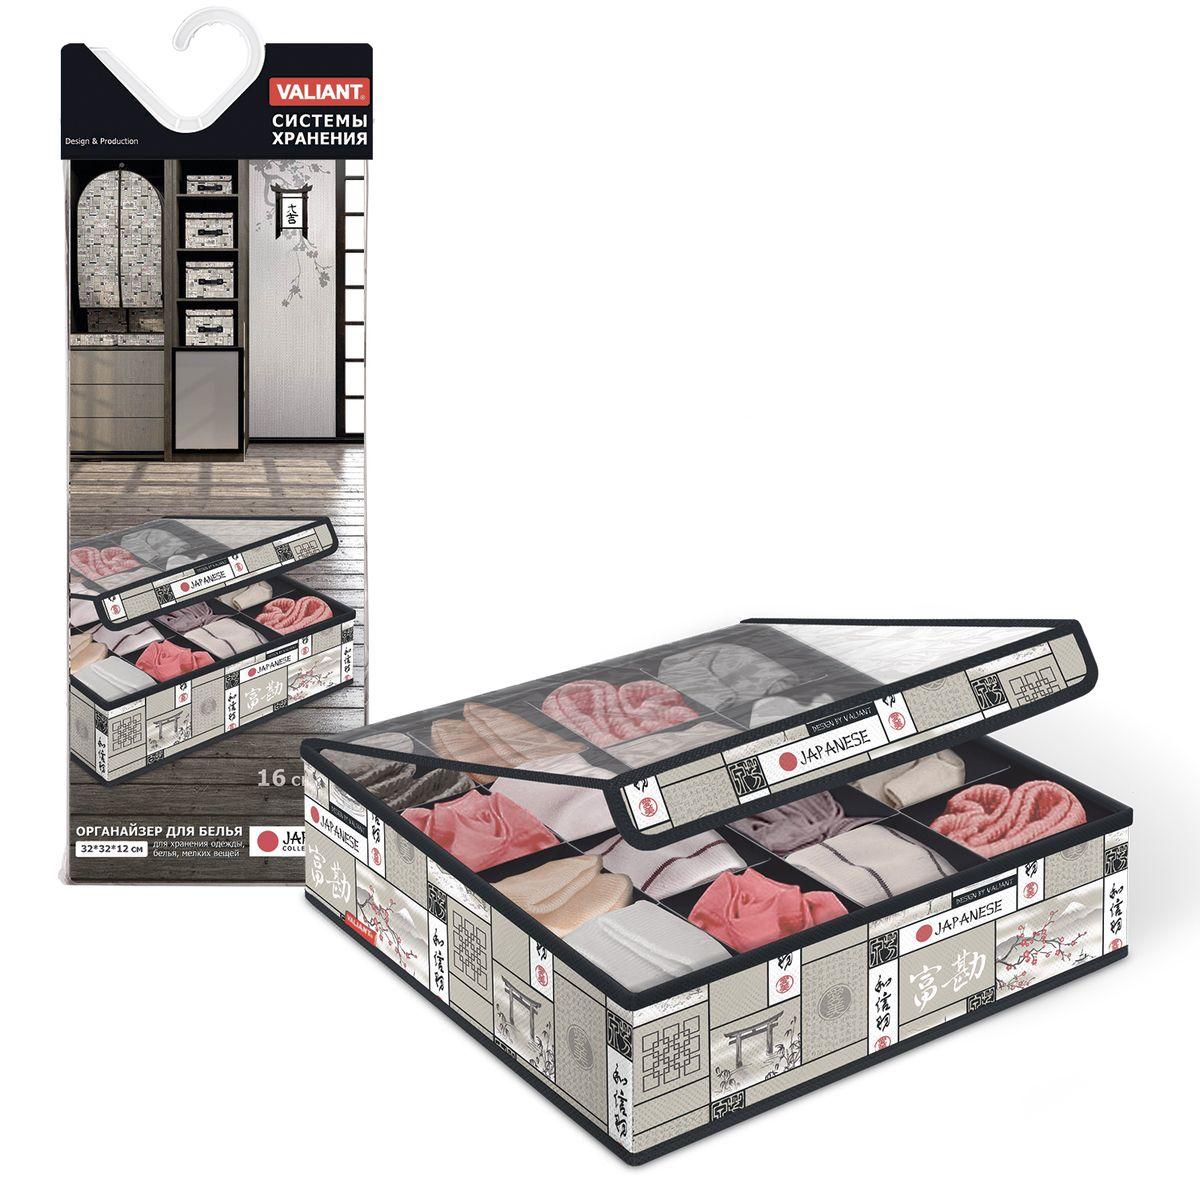 Органайзер для белья и носков Valiant Japanese White, с прозрачной крышкой, 16 секций, 32 х 32 х 12 см chiba kniebandage